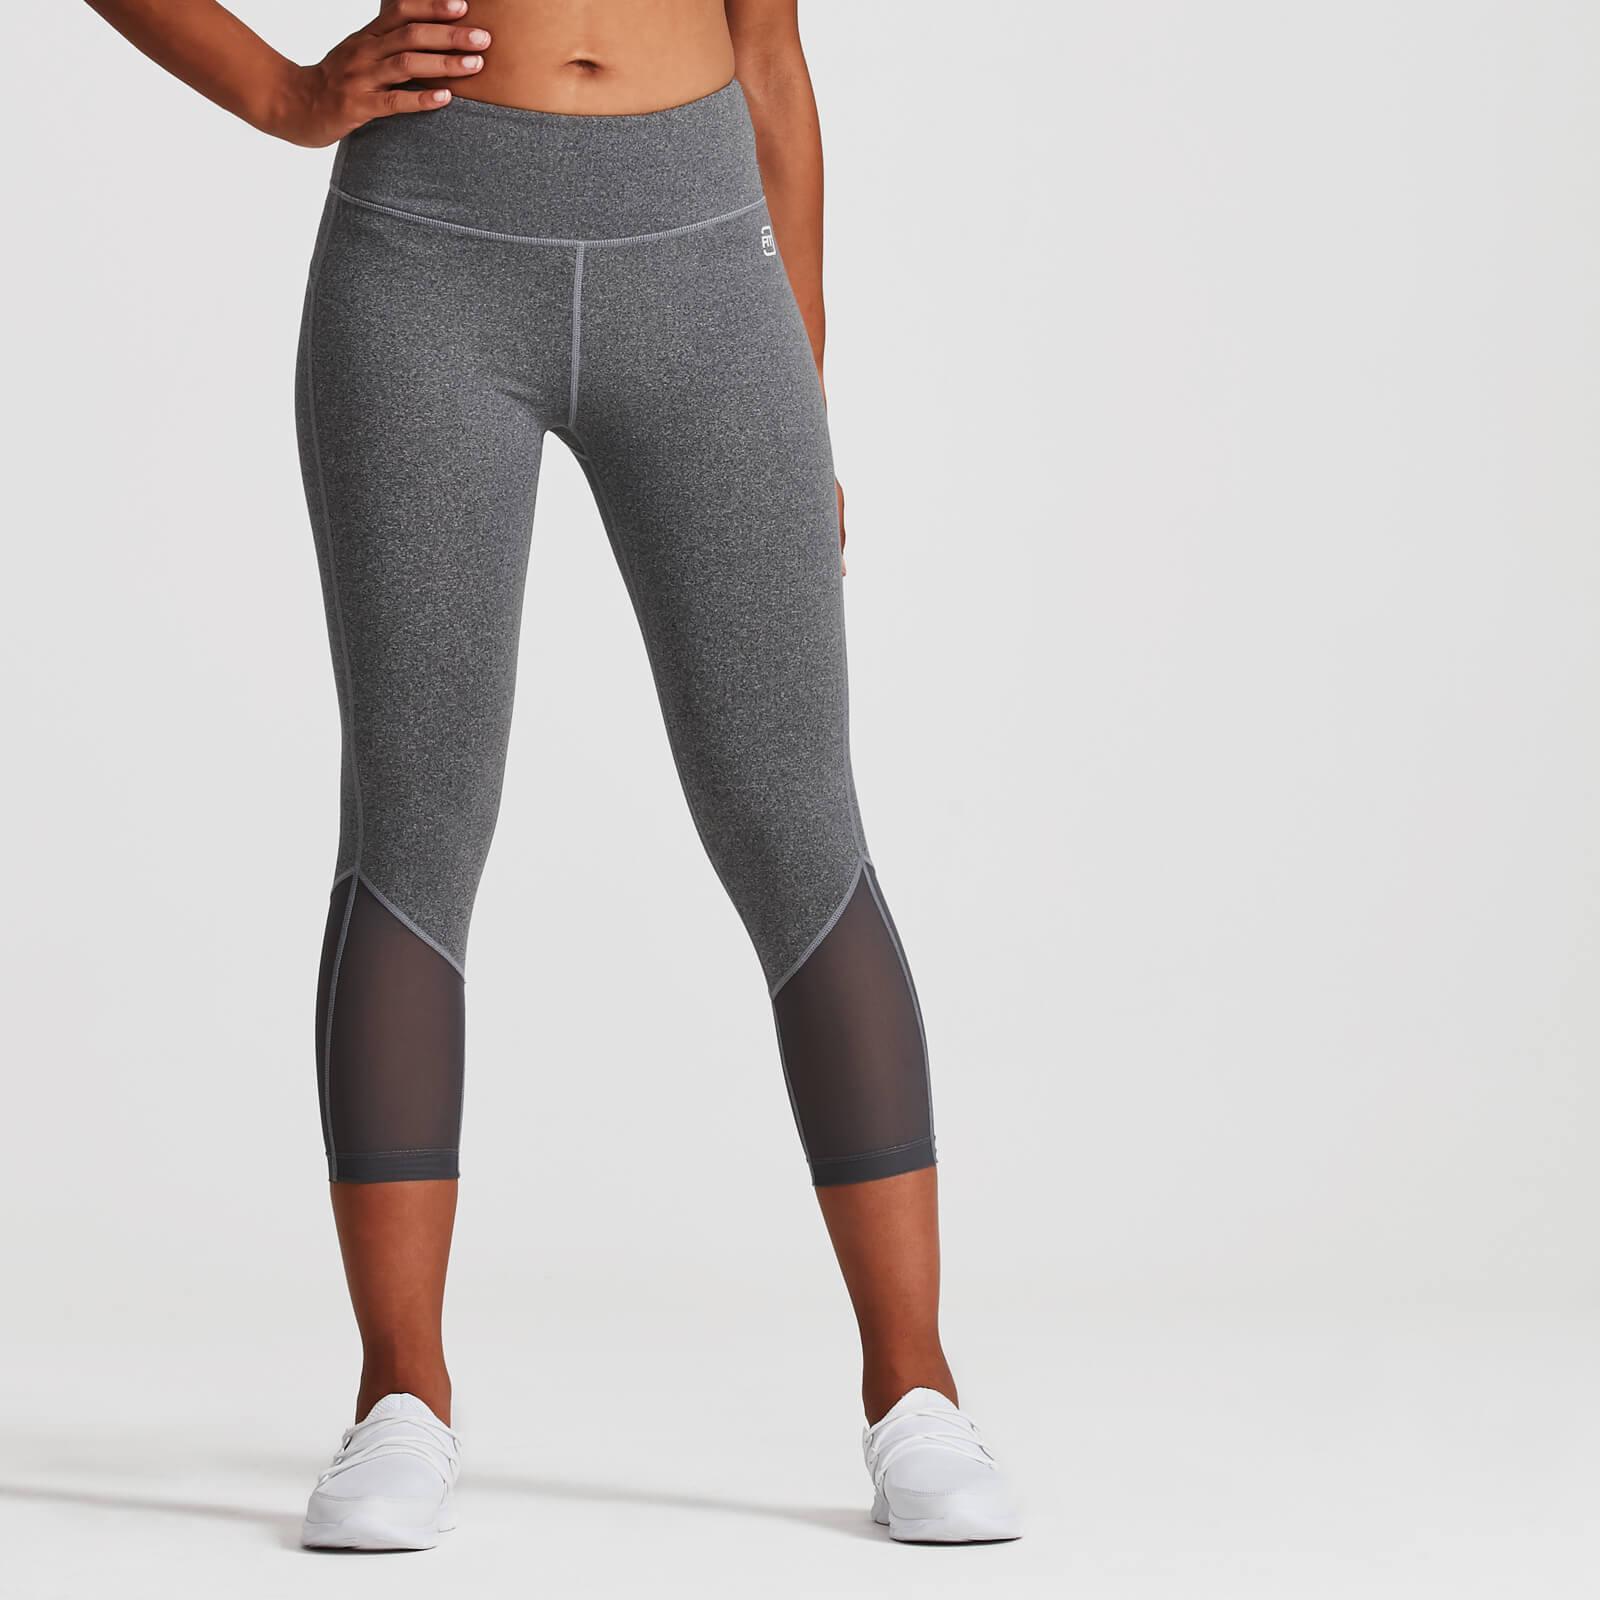 IdealFit Core Capri - Grey - M - Grey